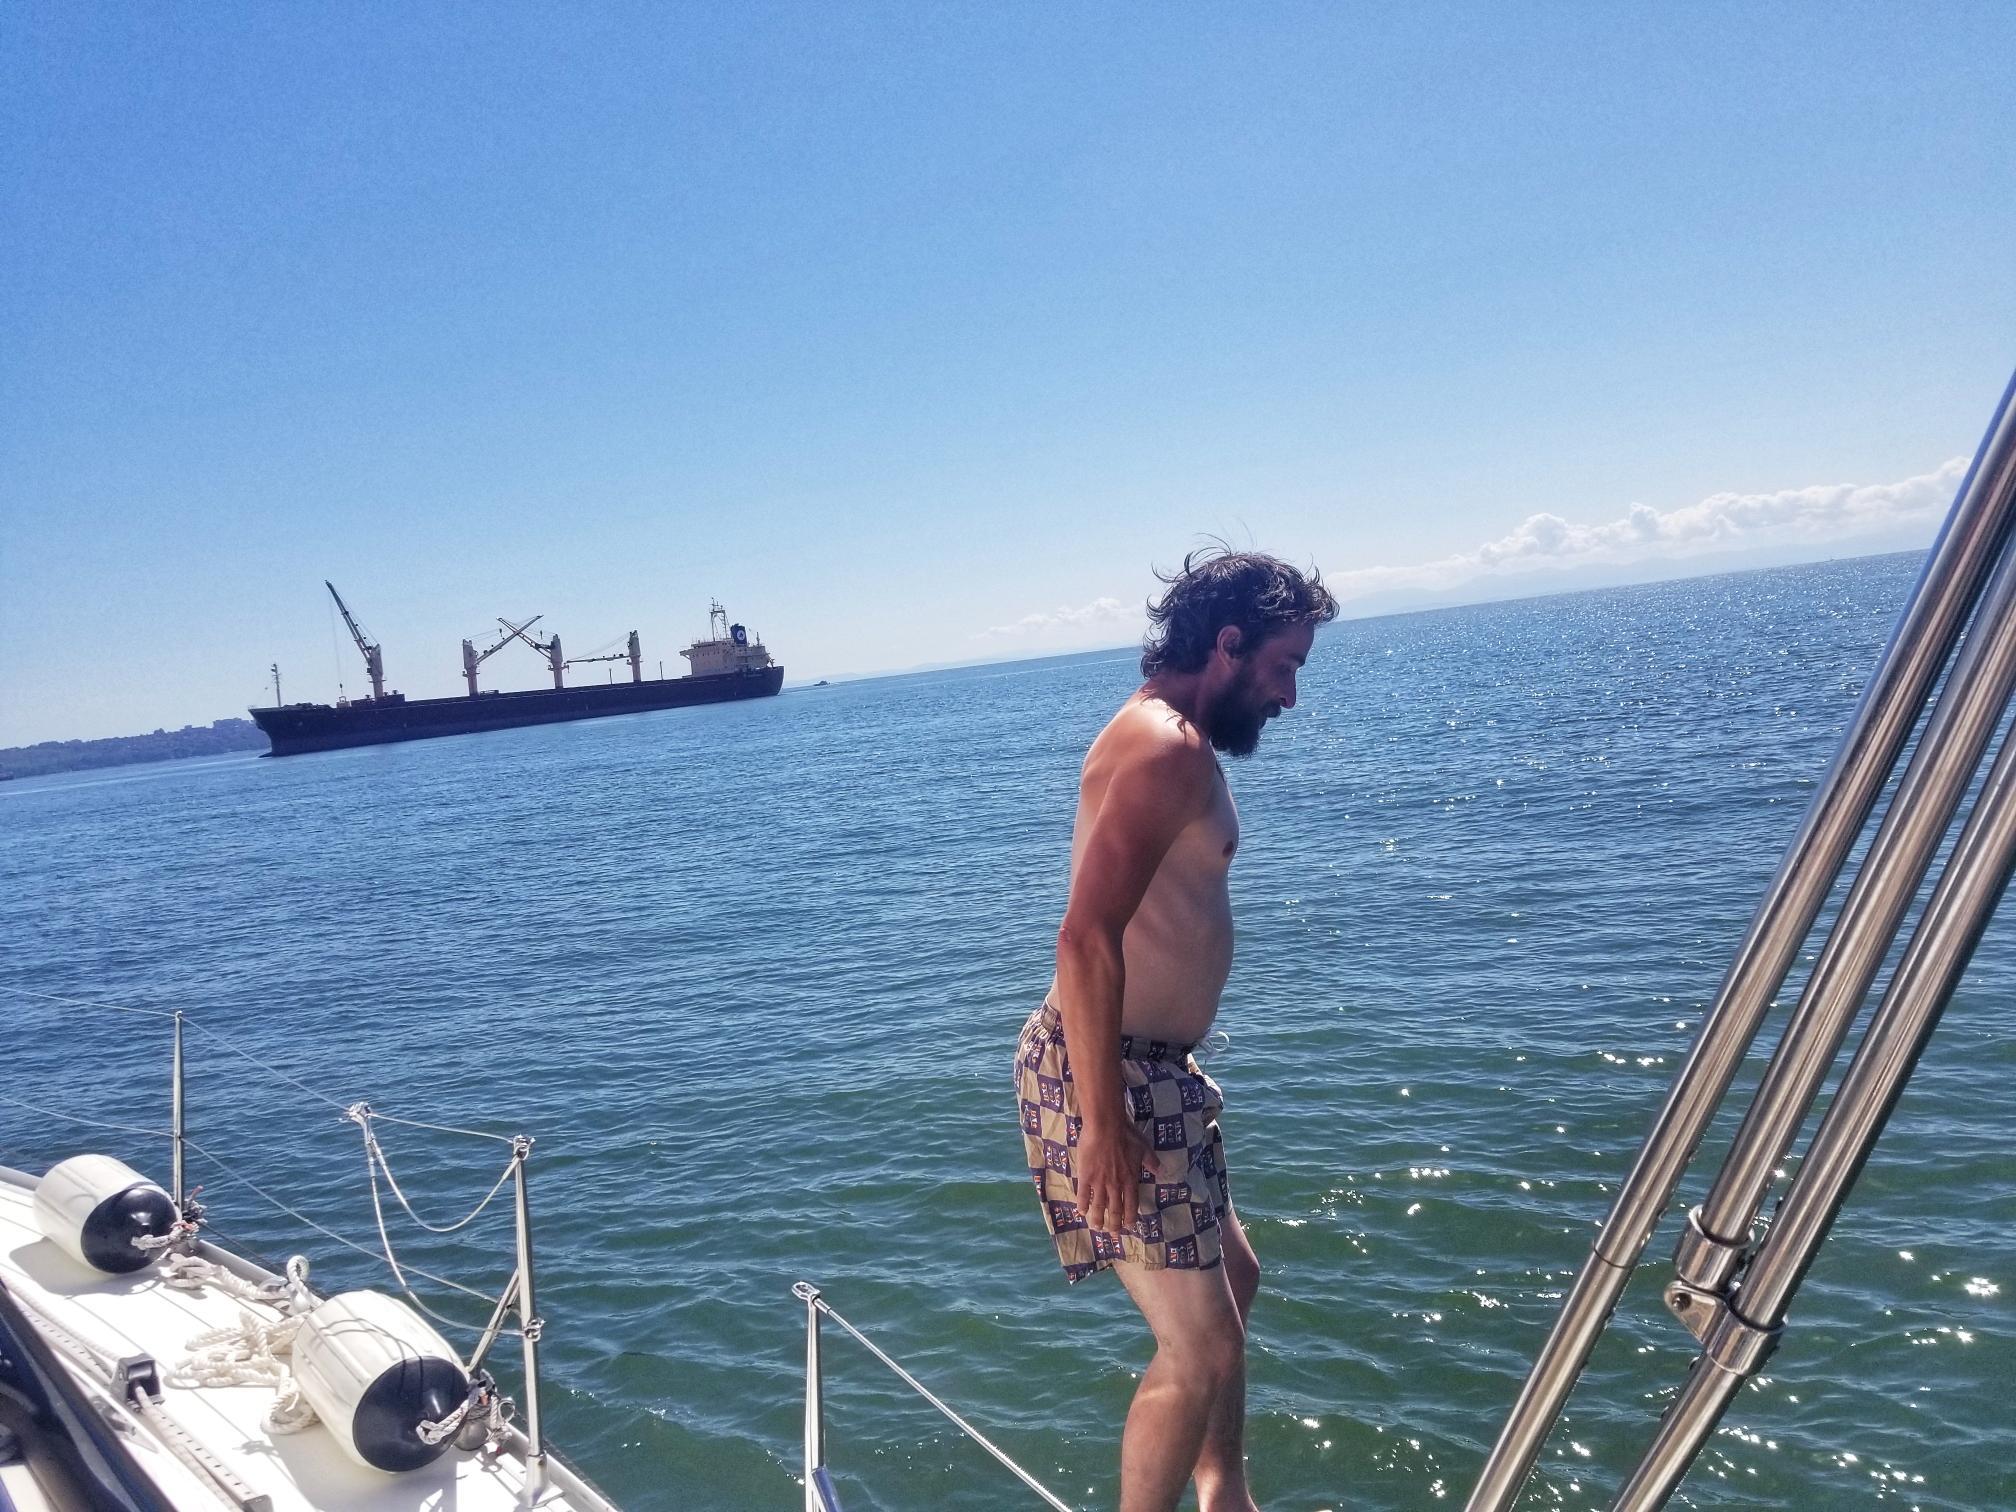 Peter jumping into English Bay